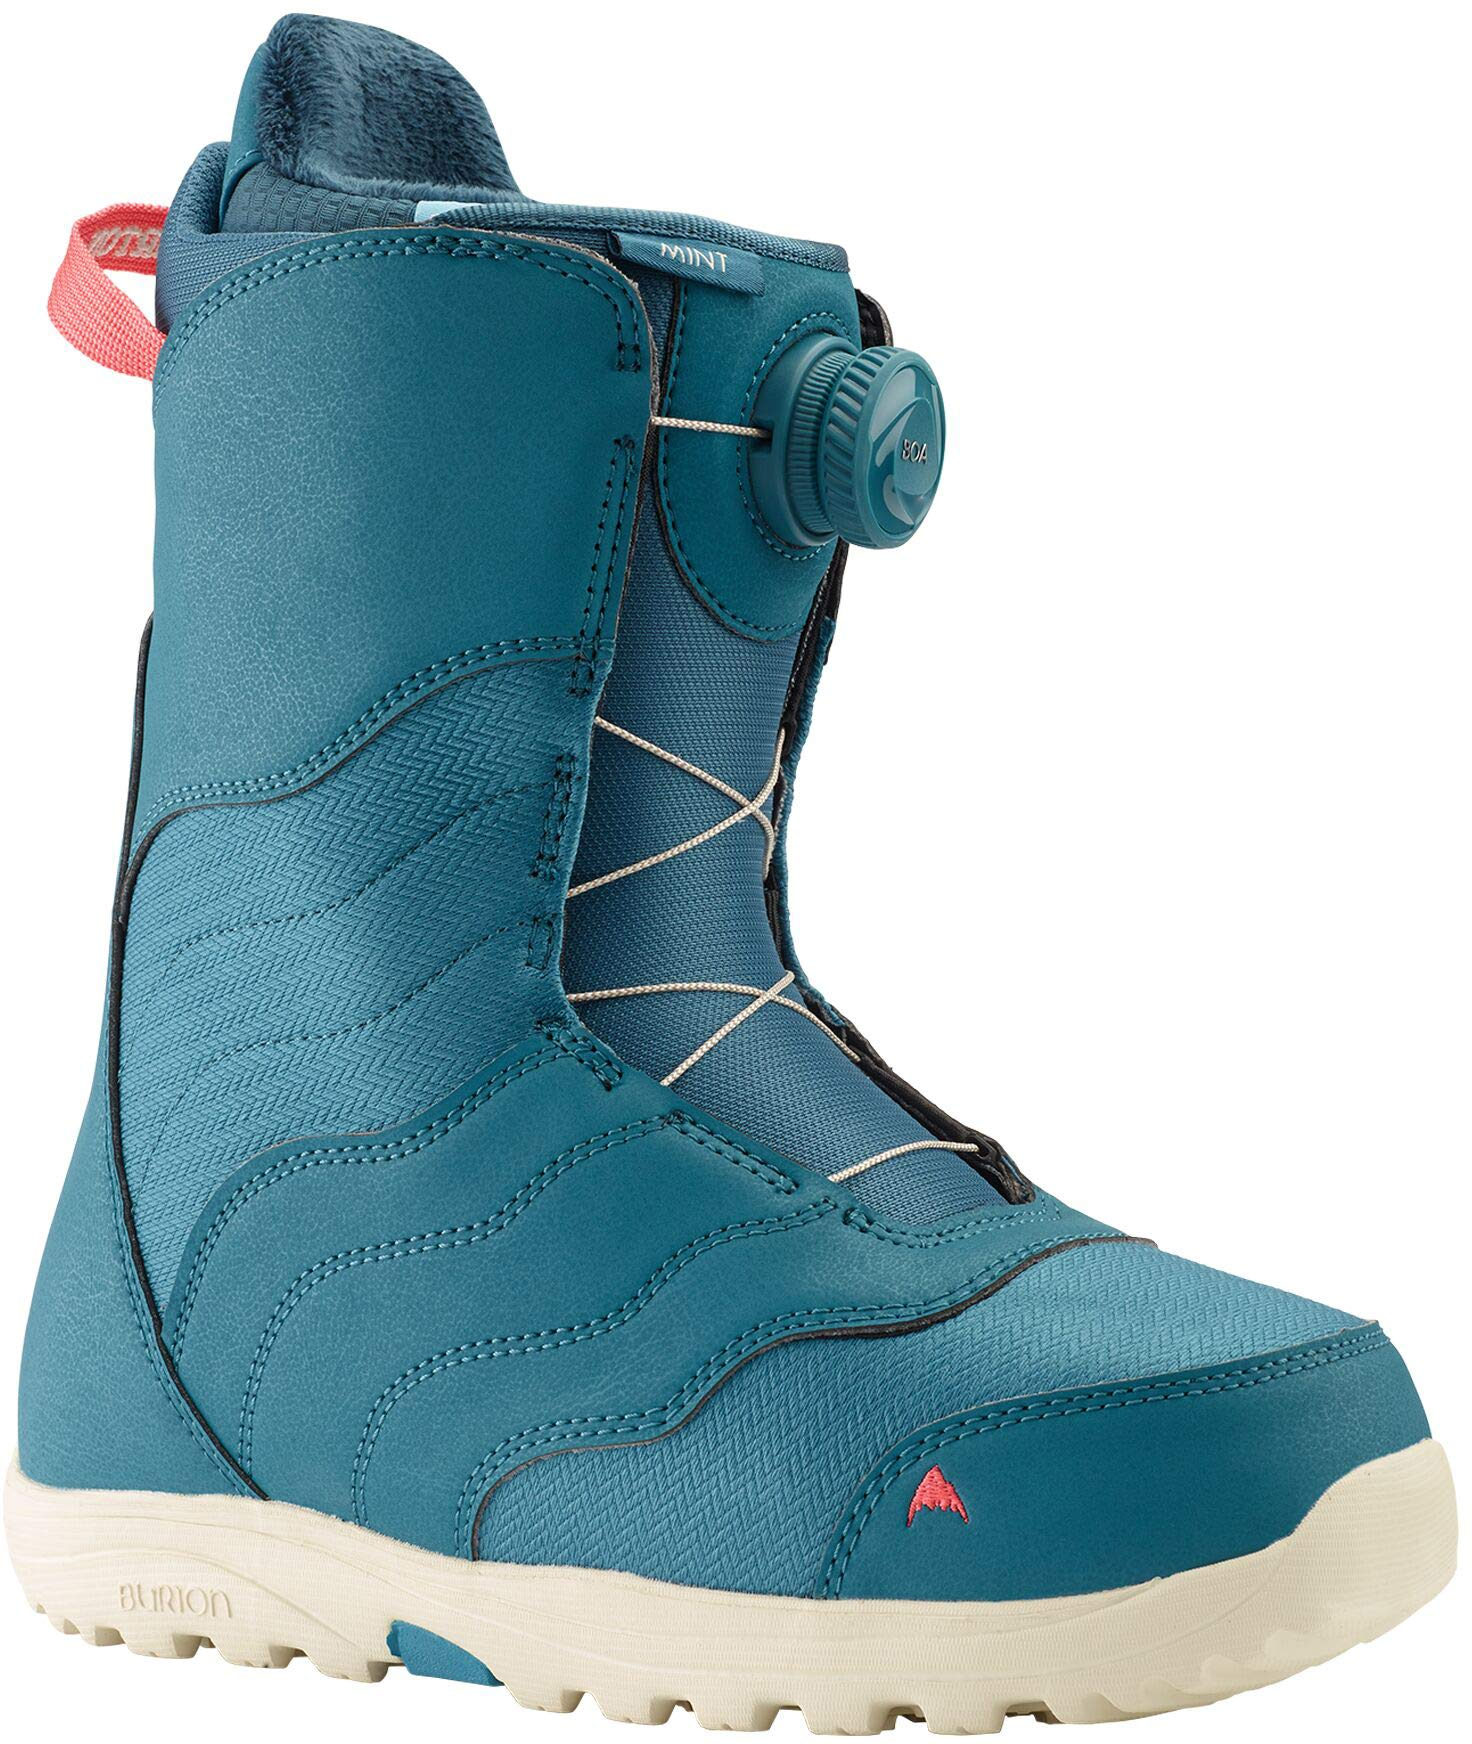 Burton Mint BOA Snowboard Boots Womens Sz 9 Storm Blue by Burton